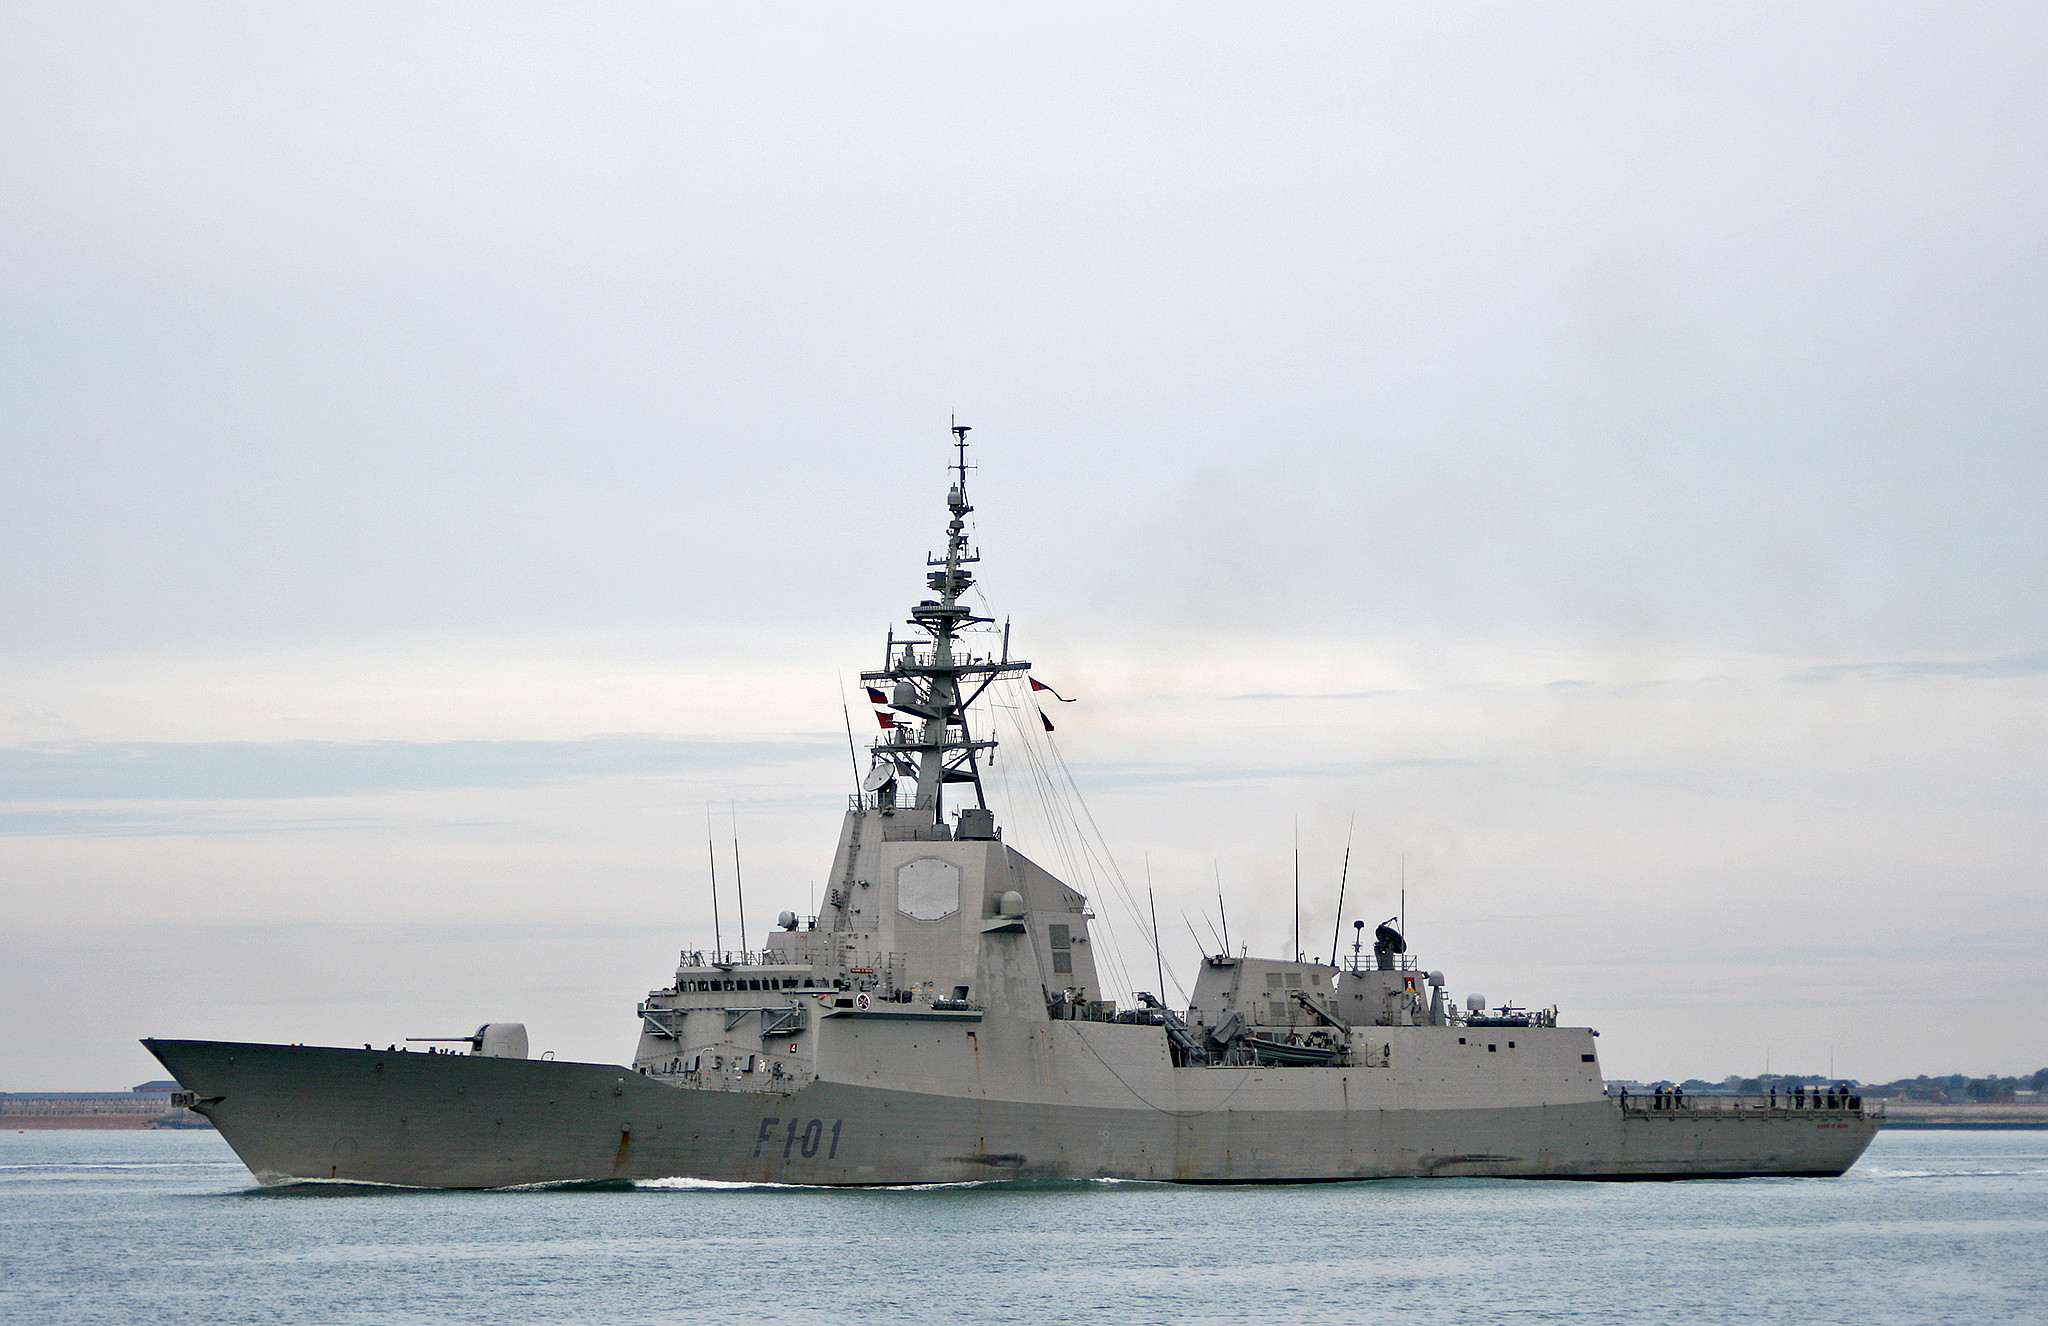 'Hobart' class destroyer